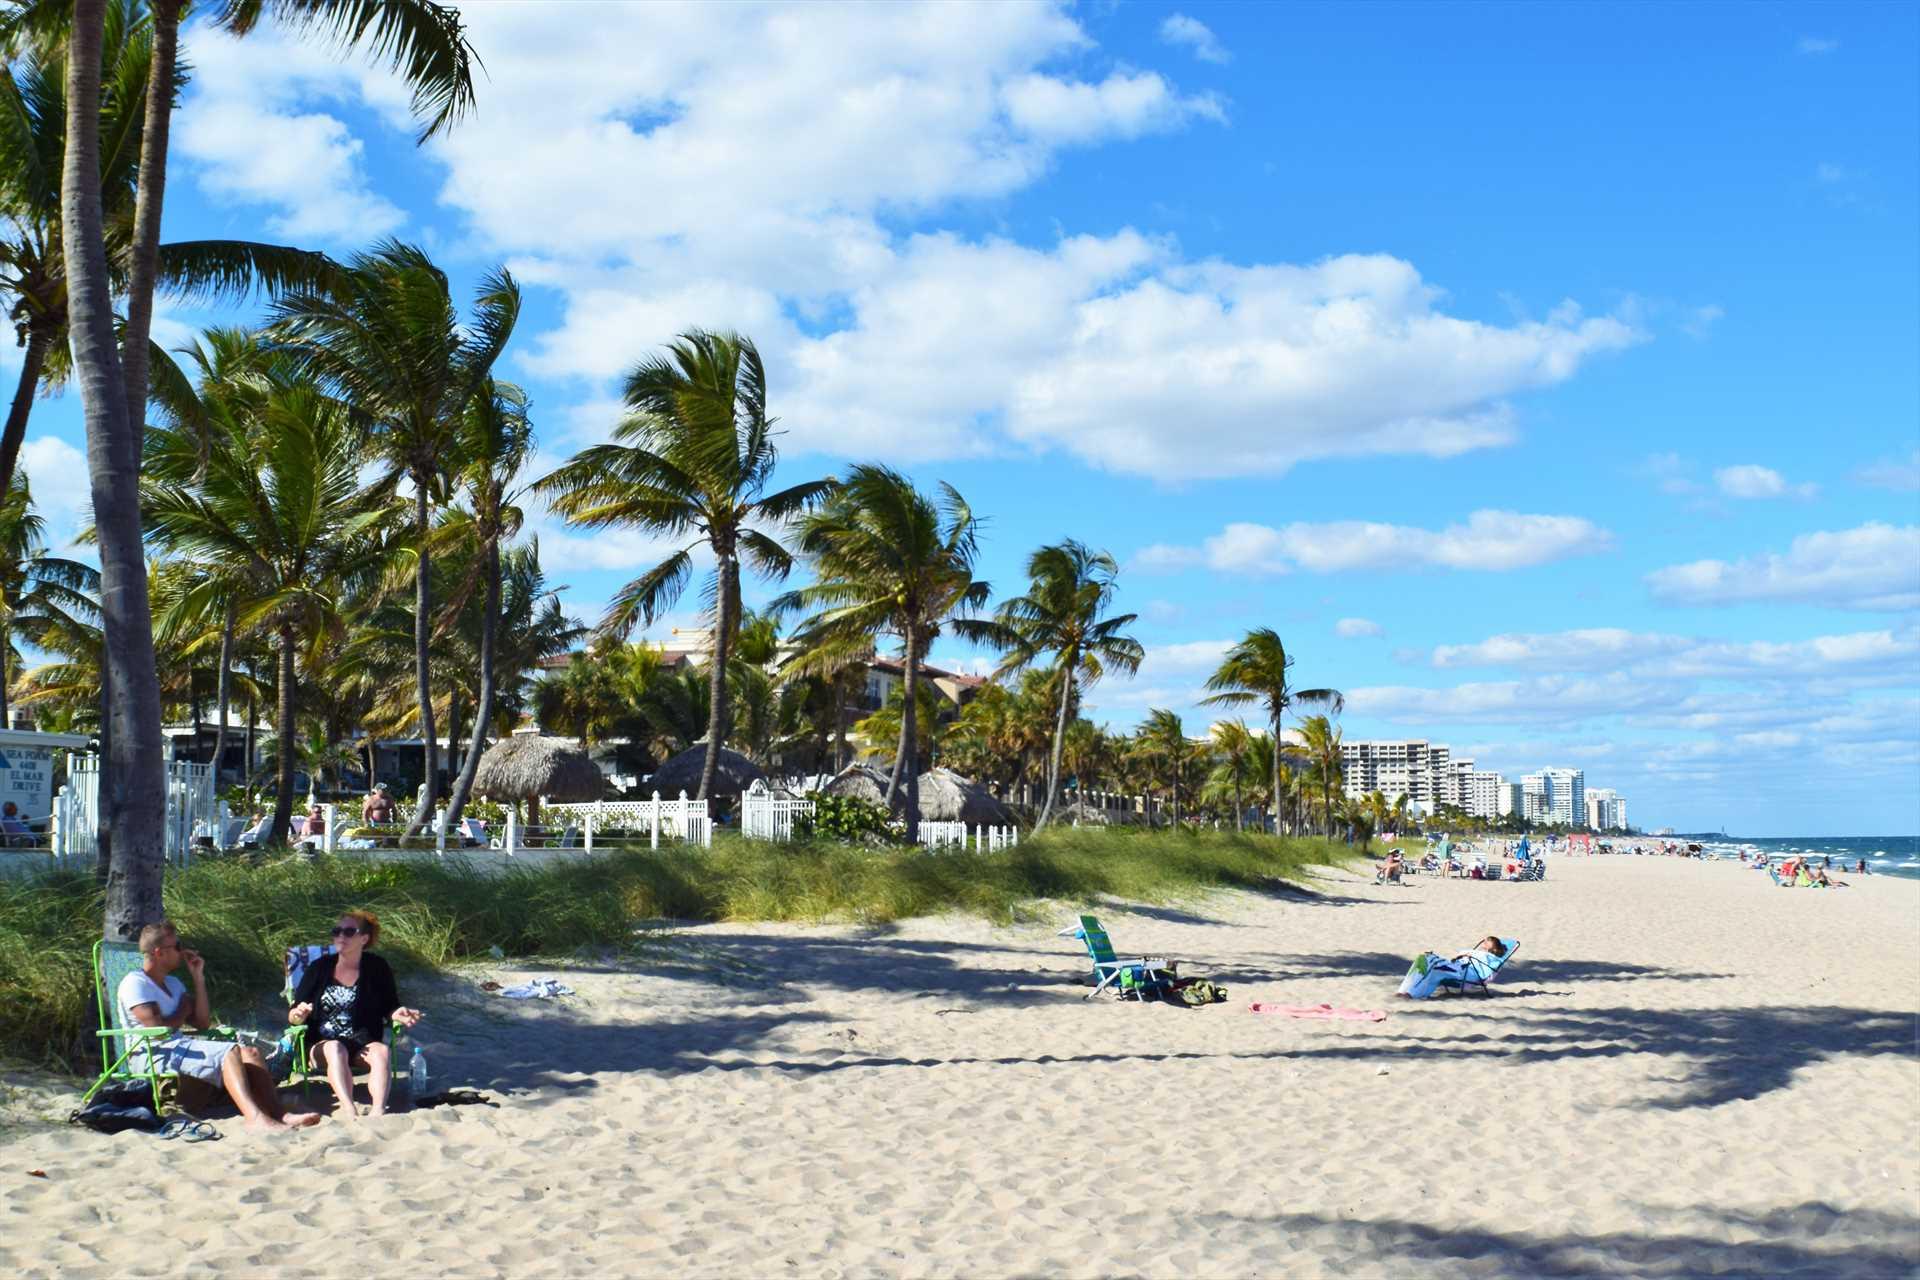 Swaying palms along the beach beckon.